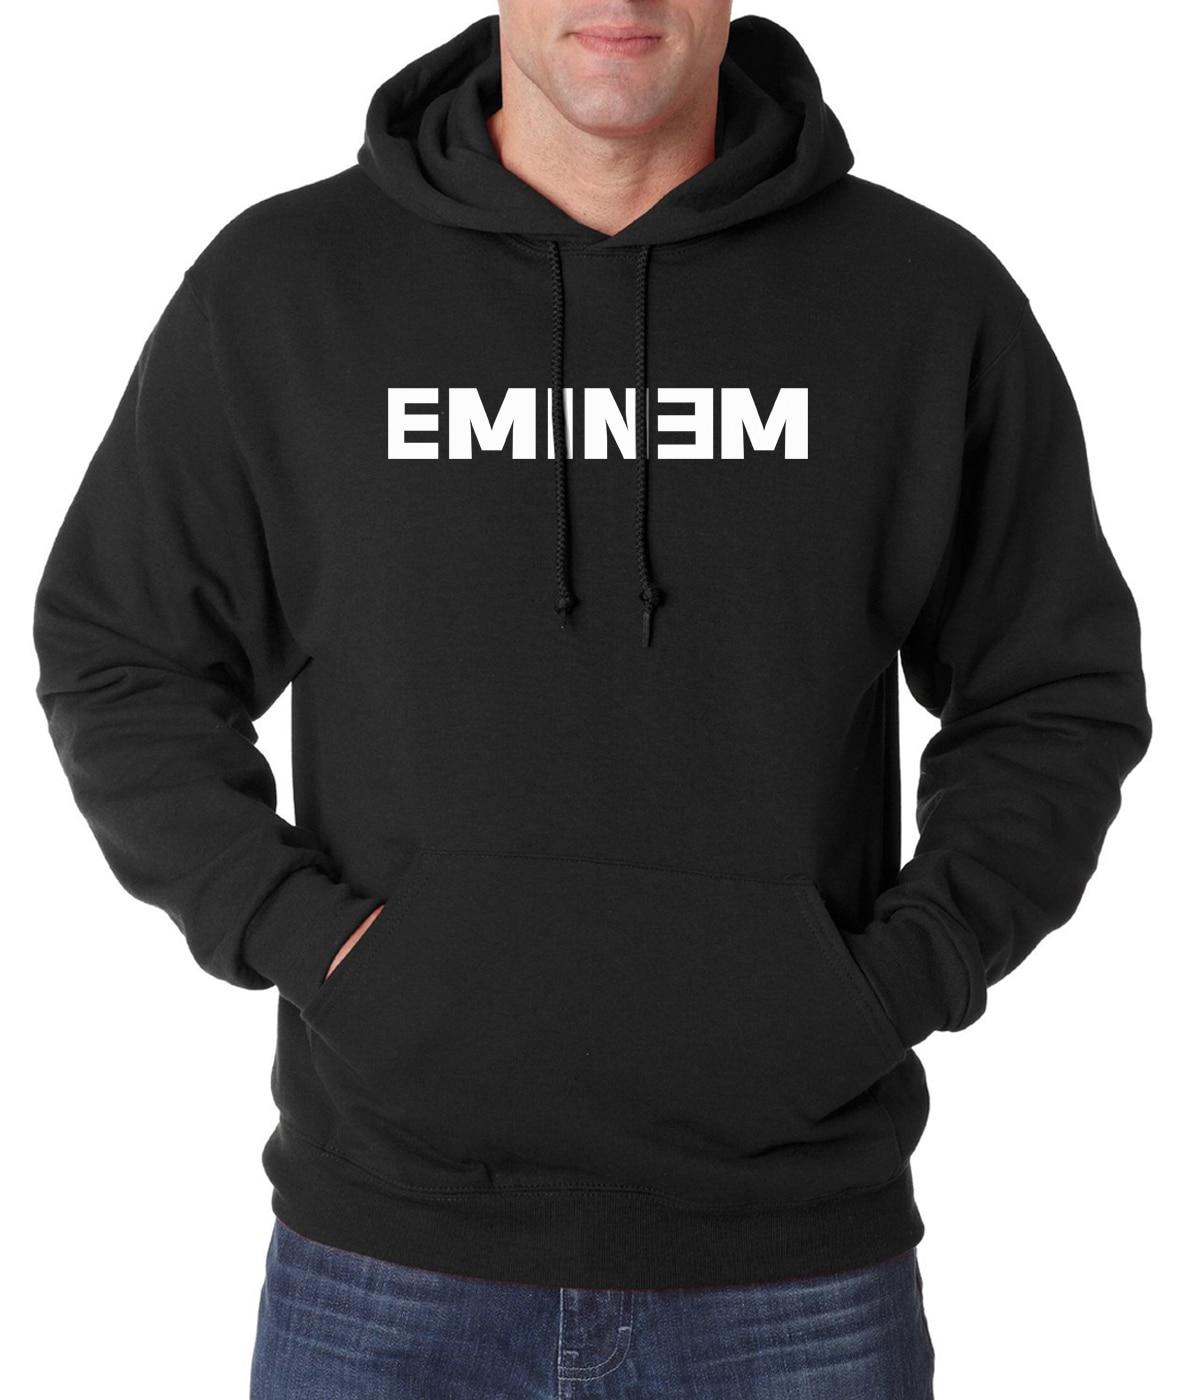 Music    Hoodies   sweatshirt men 2019 spring winter new  hoodie hip hop men fashion sudadera hombre